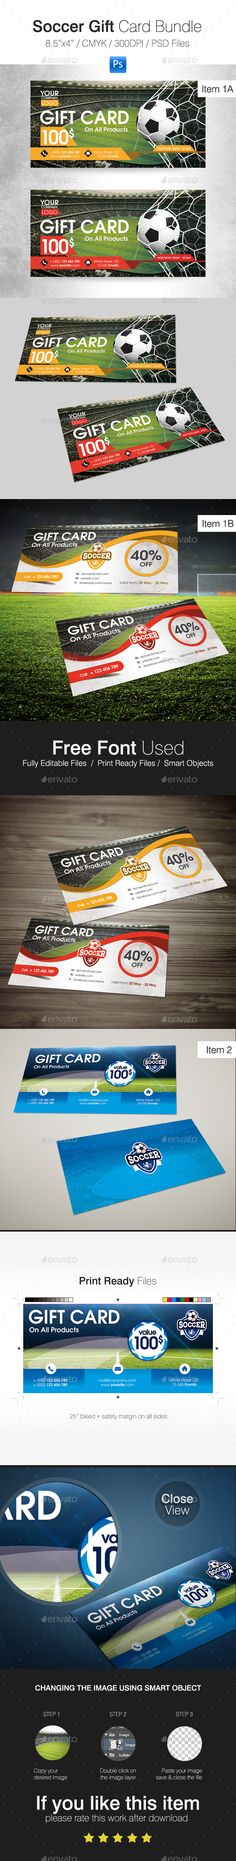 Soccer Gift Card Bundle - Cards & Invites Print Templates Download: https://graphicriver.net/item/soccer-gift-card-bundle/20004963